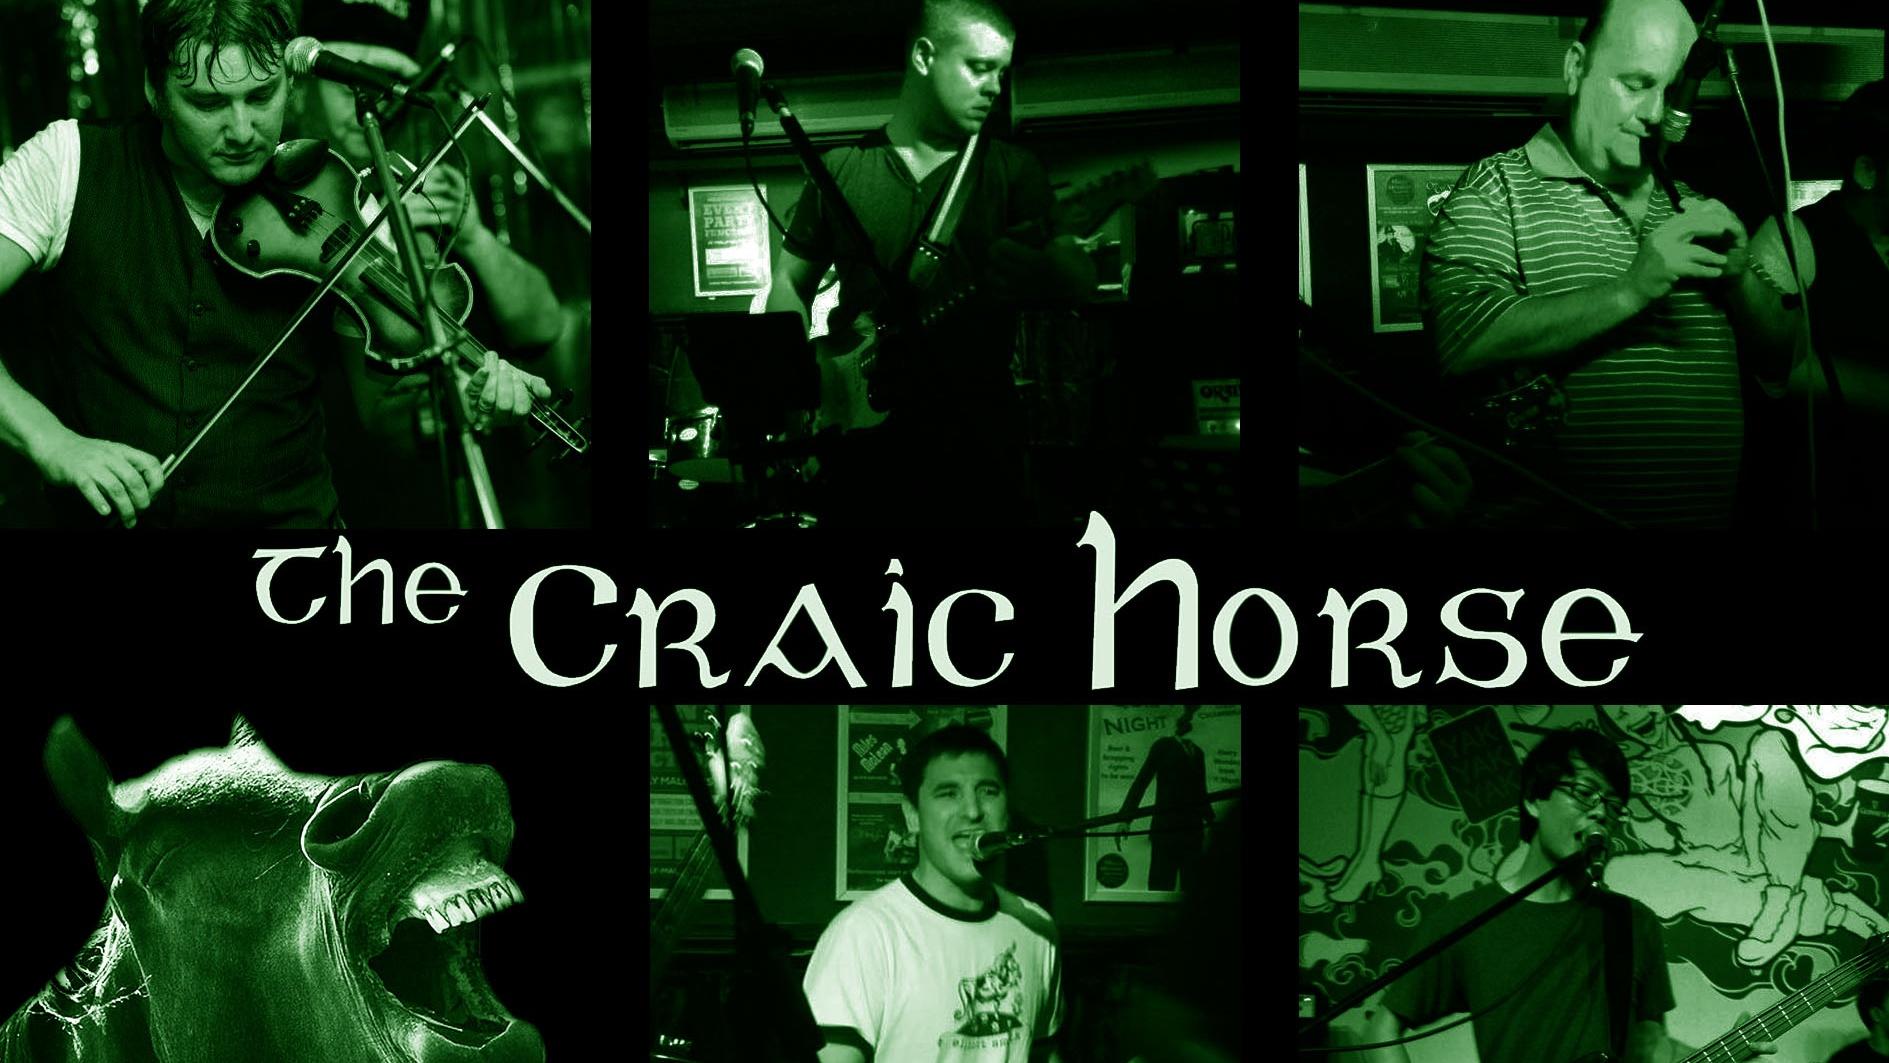 The Craic Horse